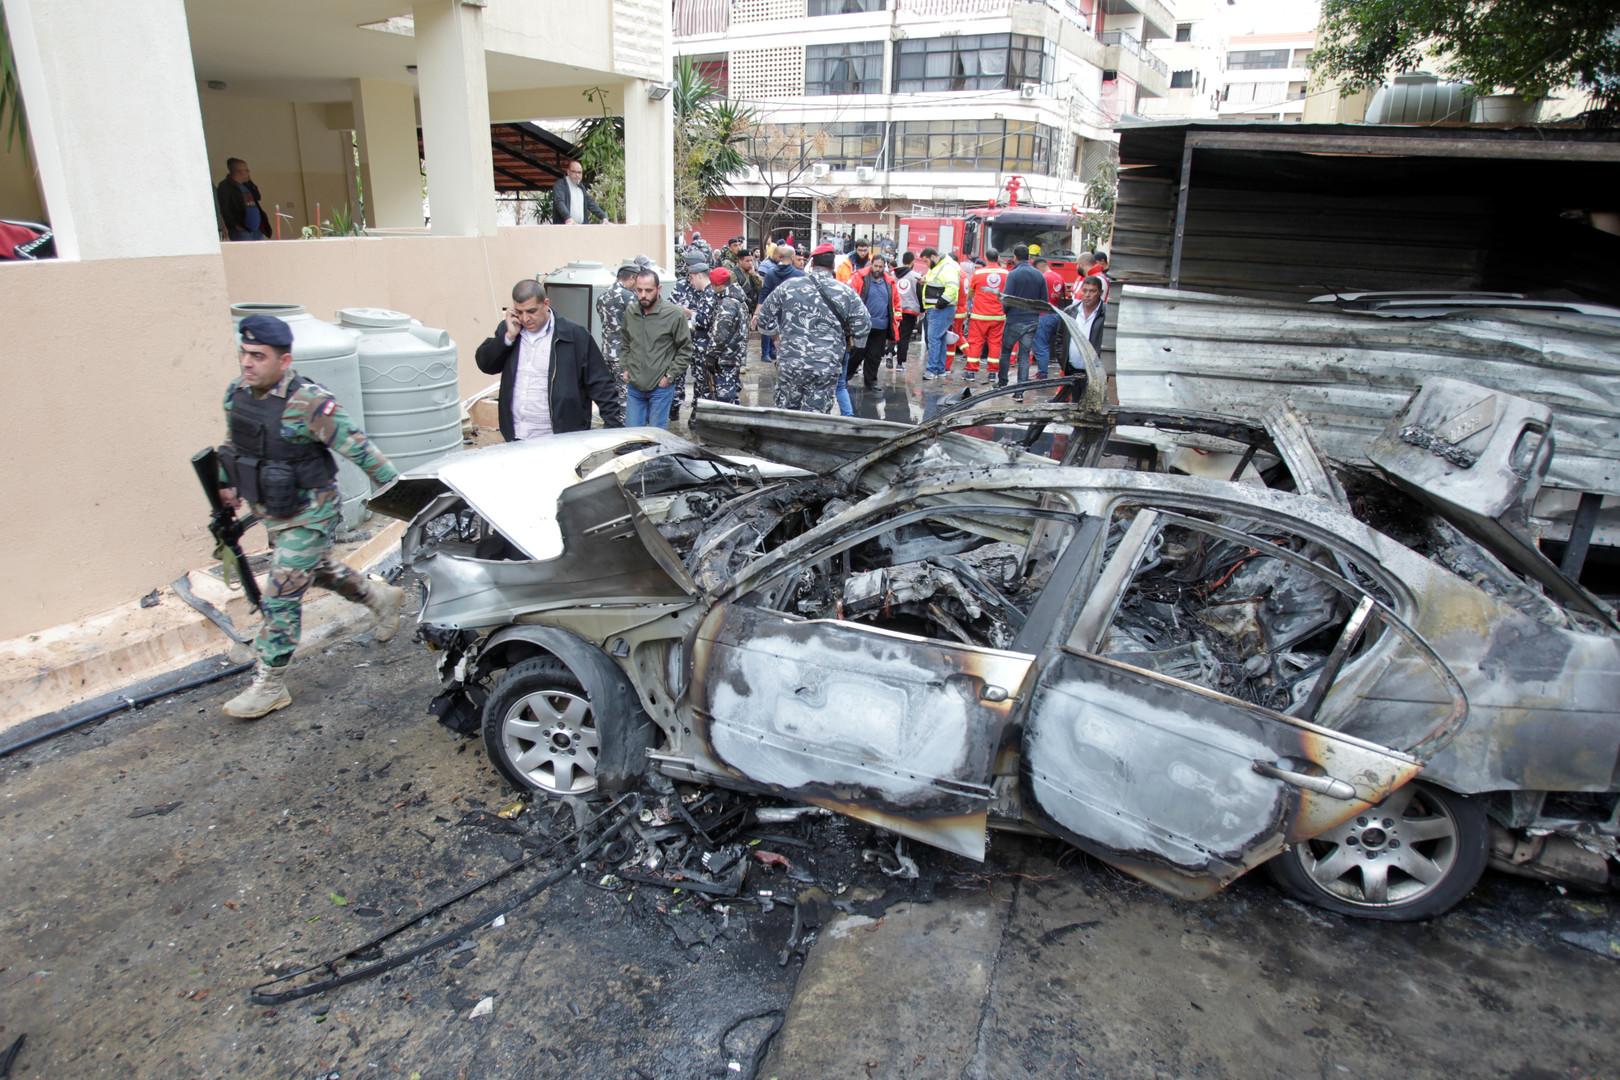 Liban : le Hamas accuse Israël d'être à l'origine d'un attentat visant l'un de ses responsables